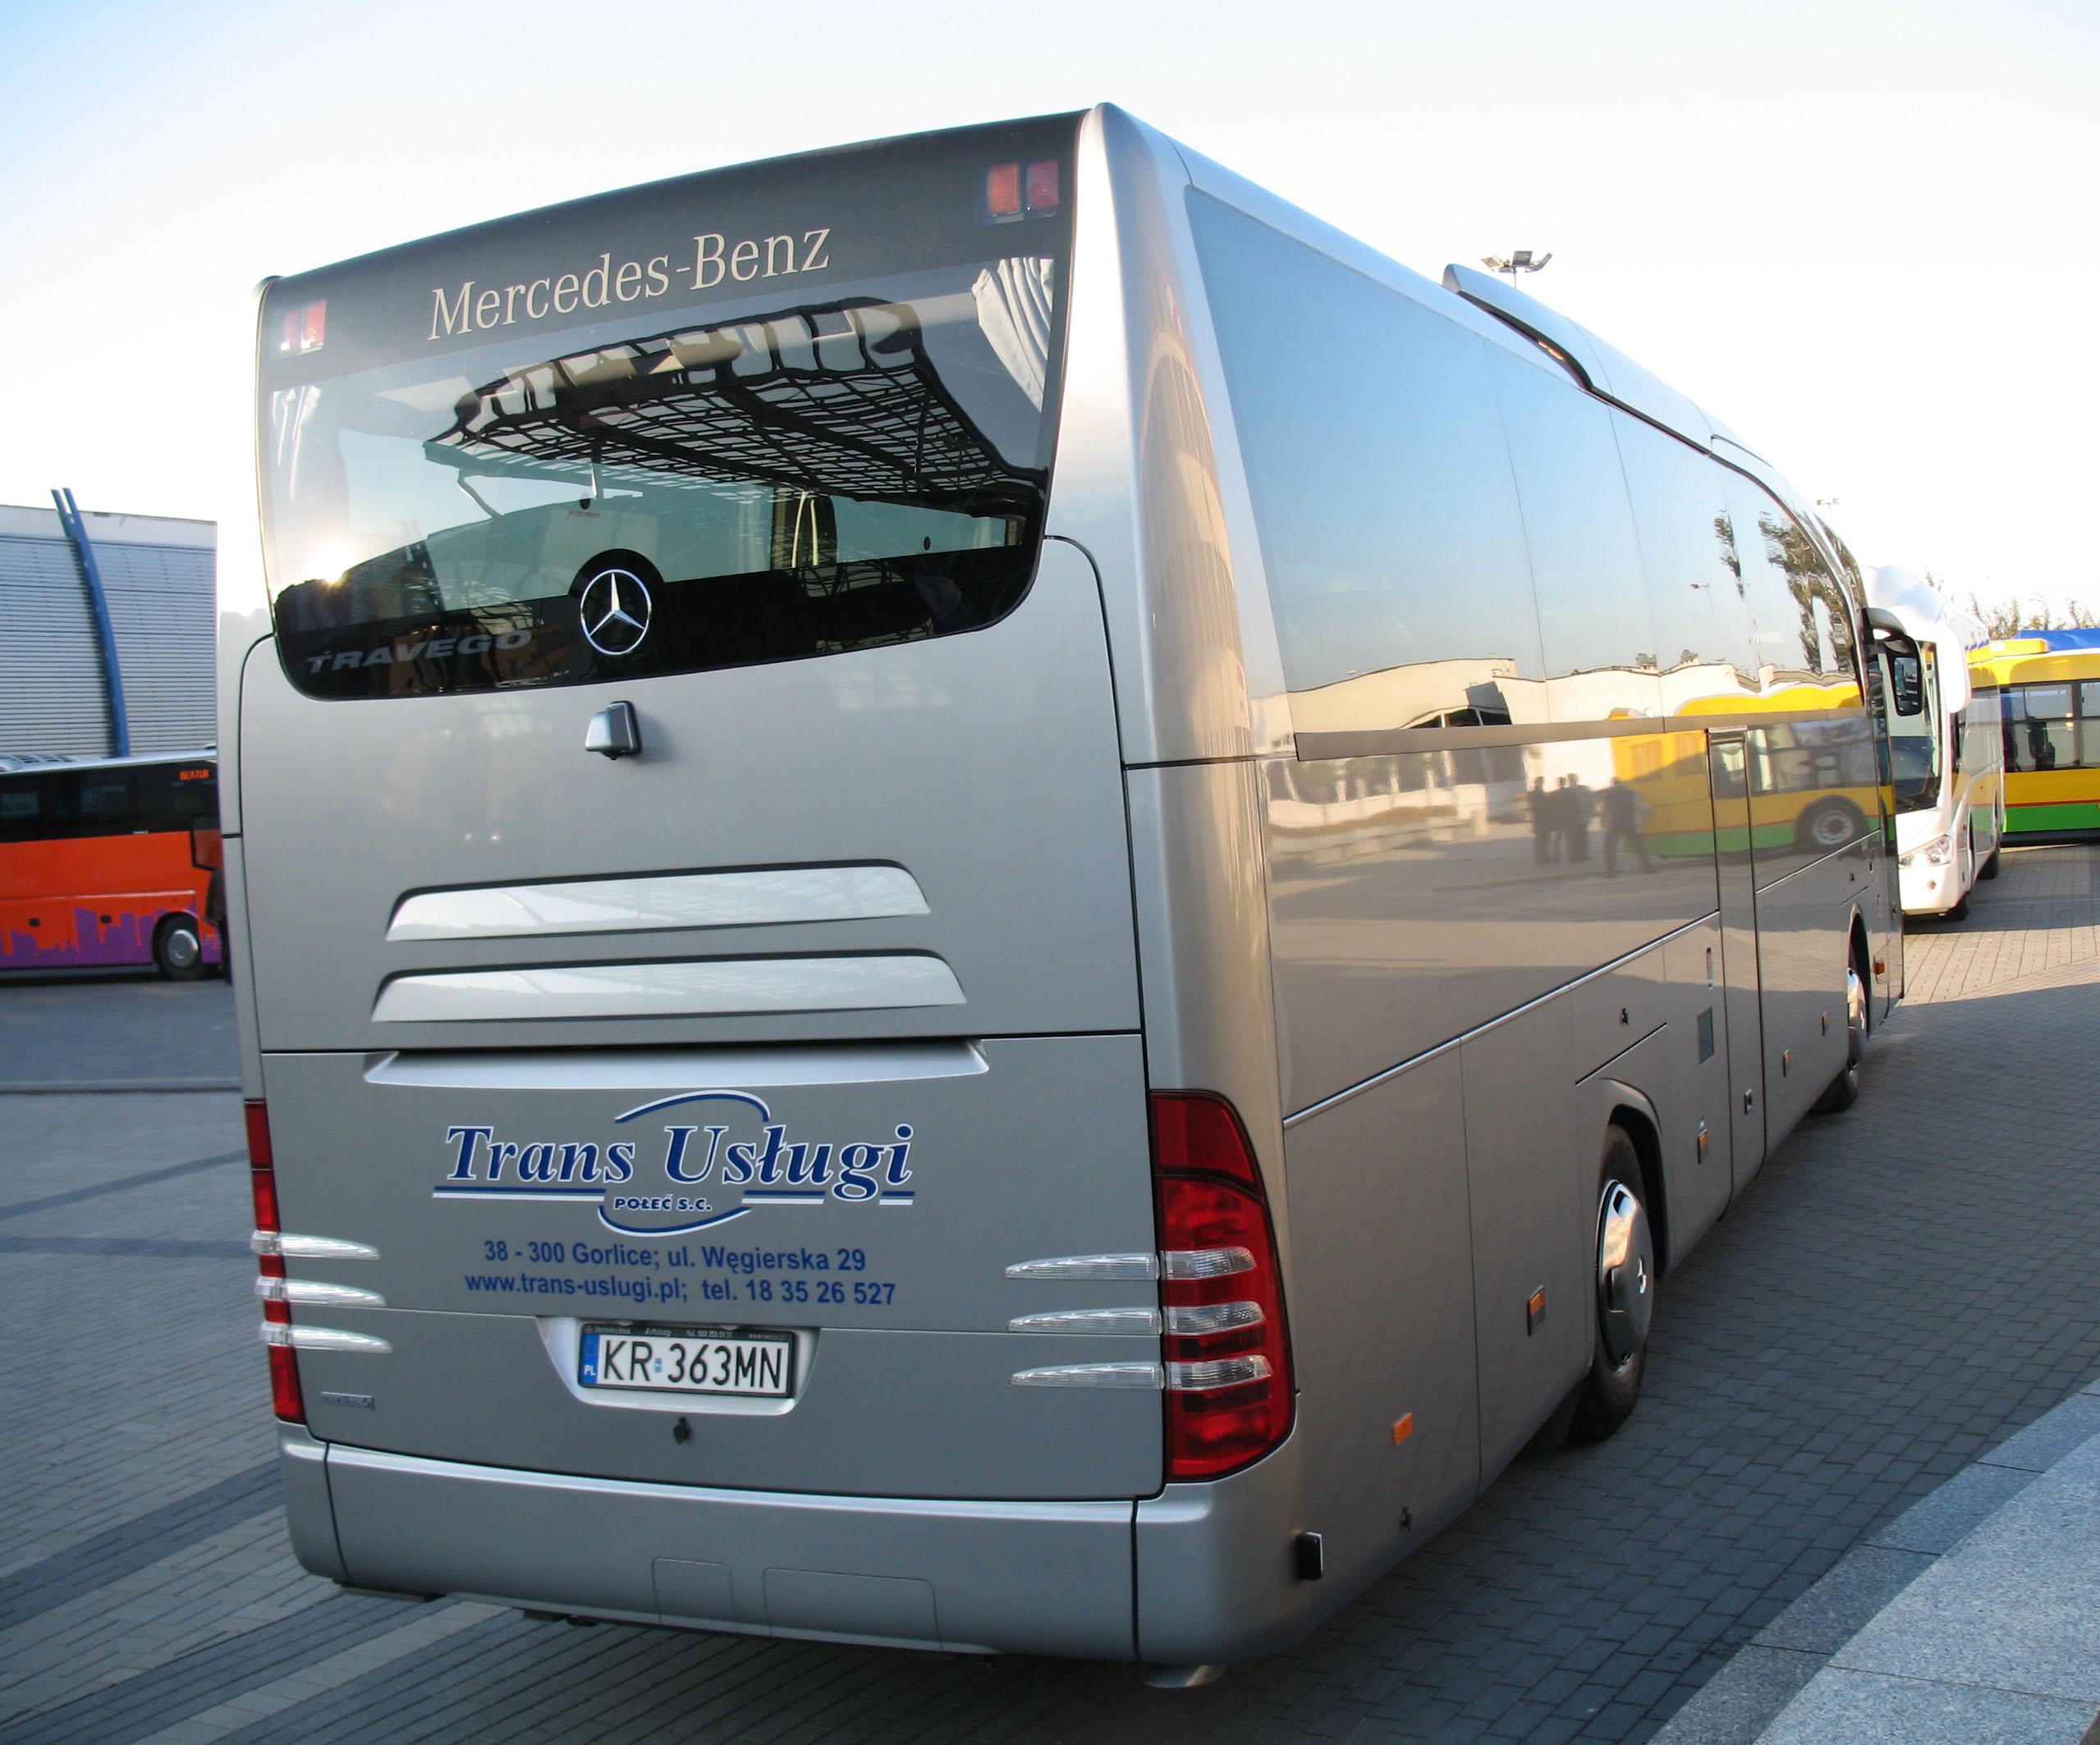 Mercedes Travego 2018 >> File:Mercedes-Benz Travego in Kielce - rear.jpg - Wikimedia Commons